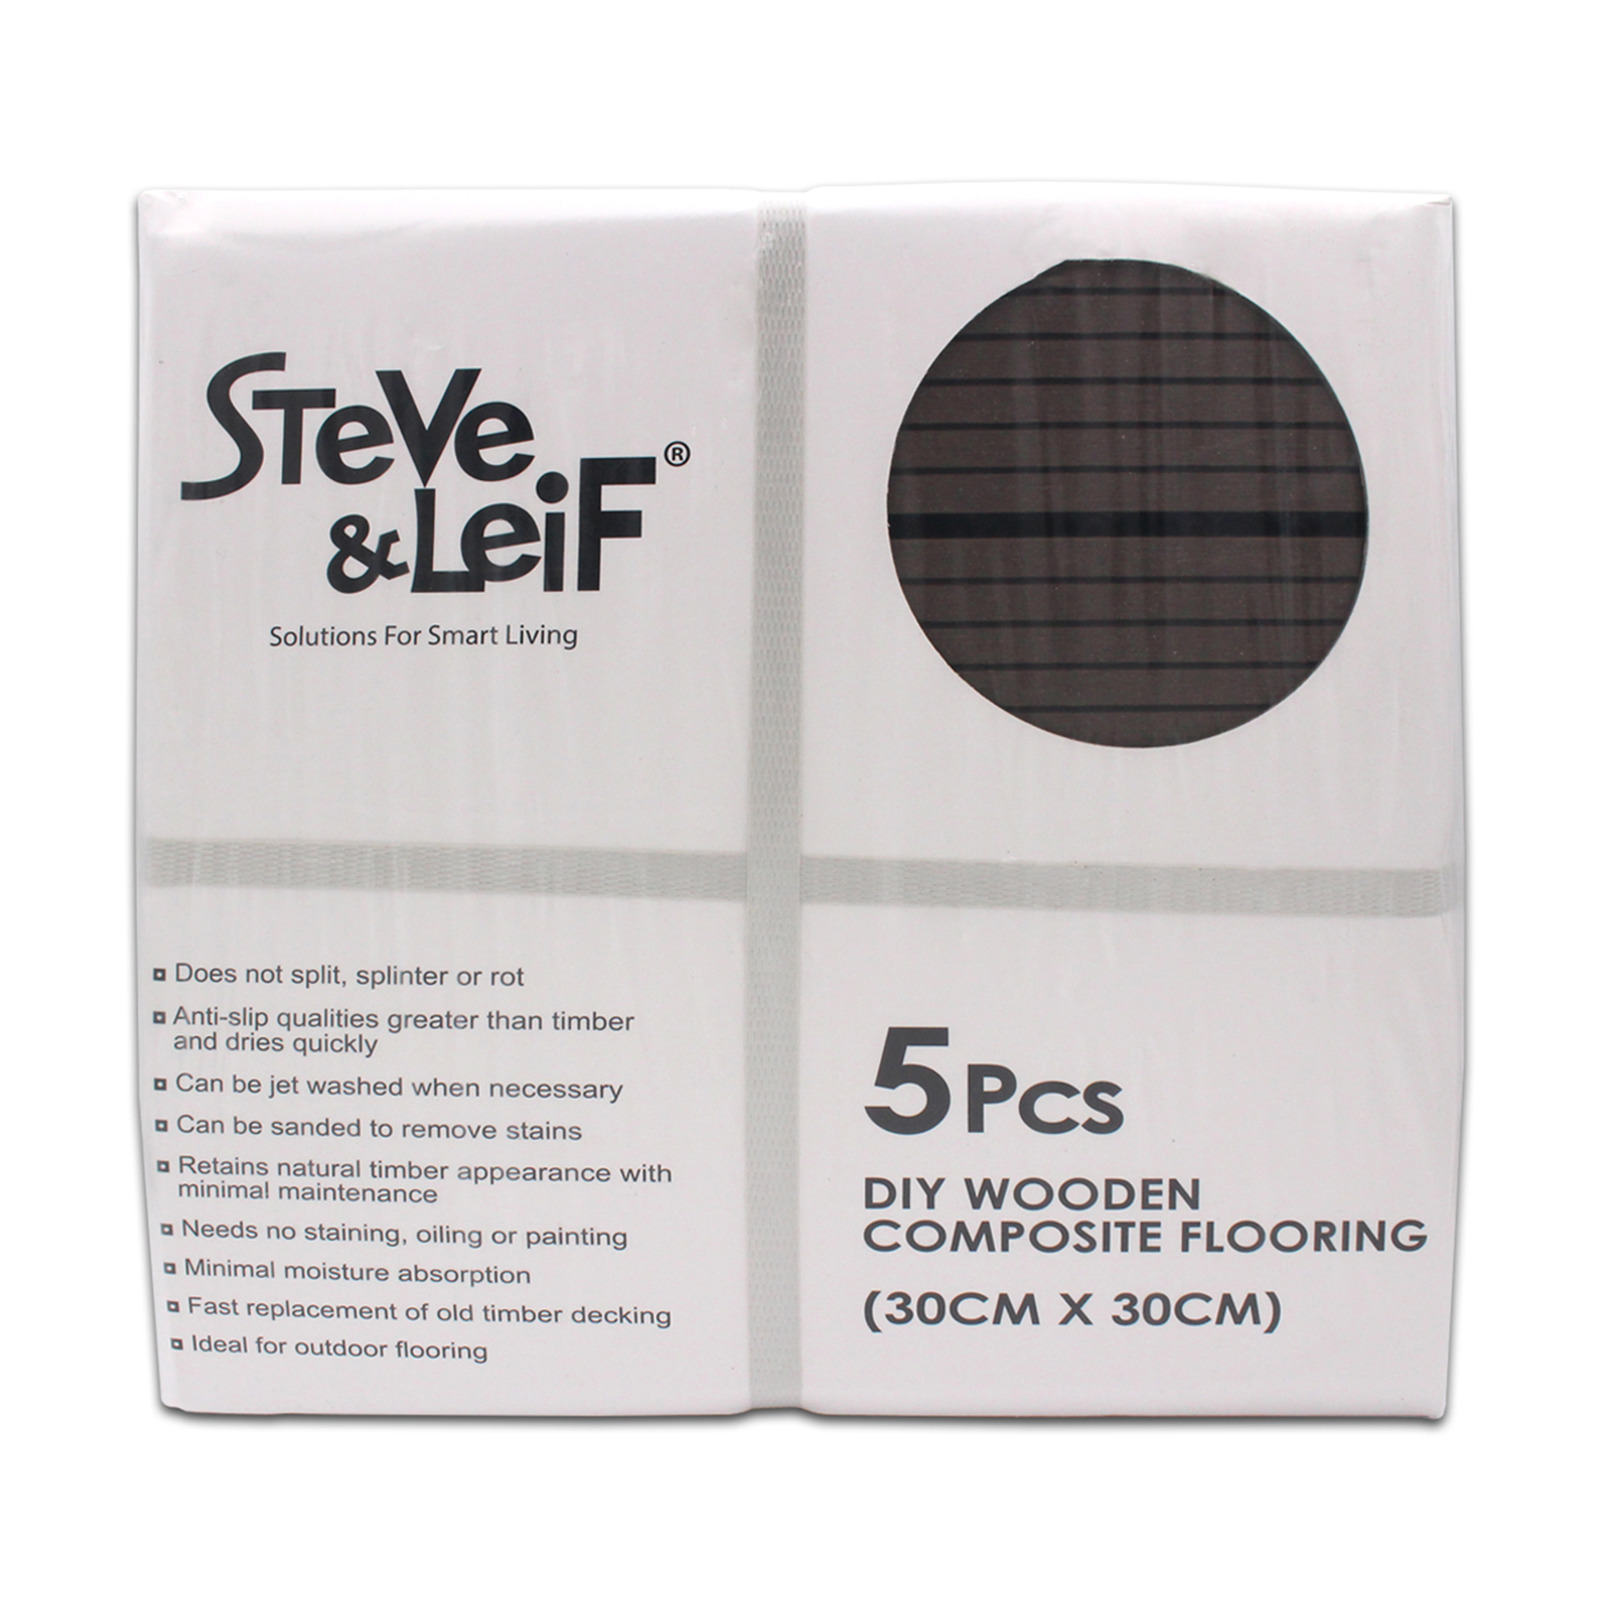 Steve & Leif DIY Composite Floor Coffee (300x300mm) 5Pcs/Pack